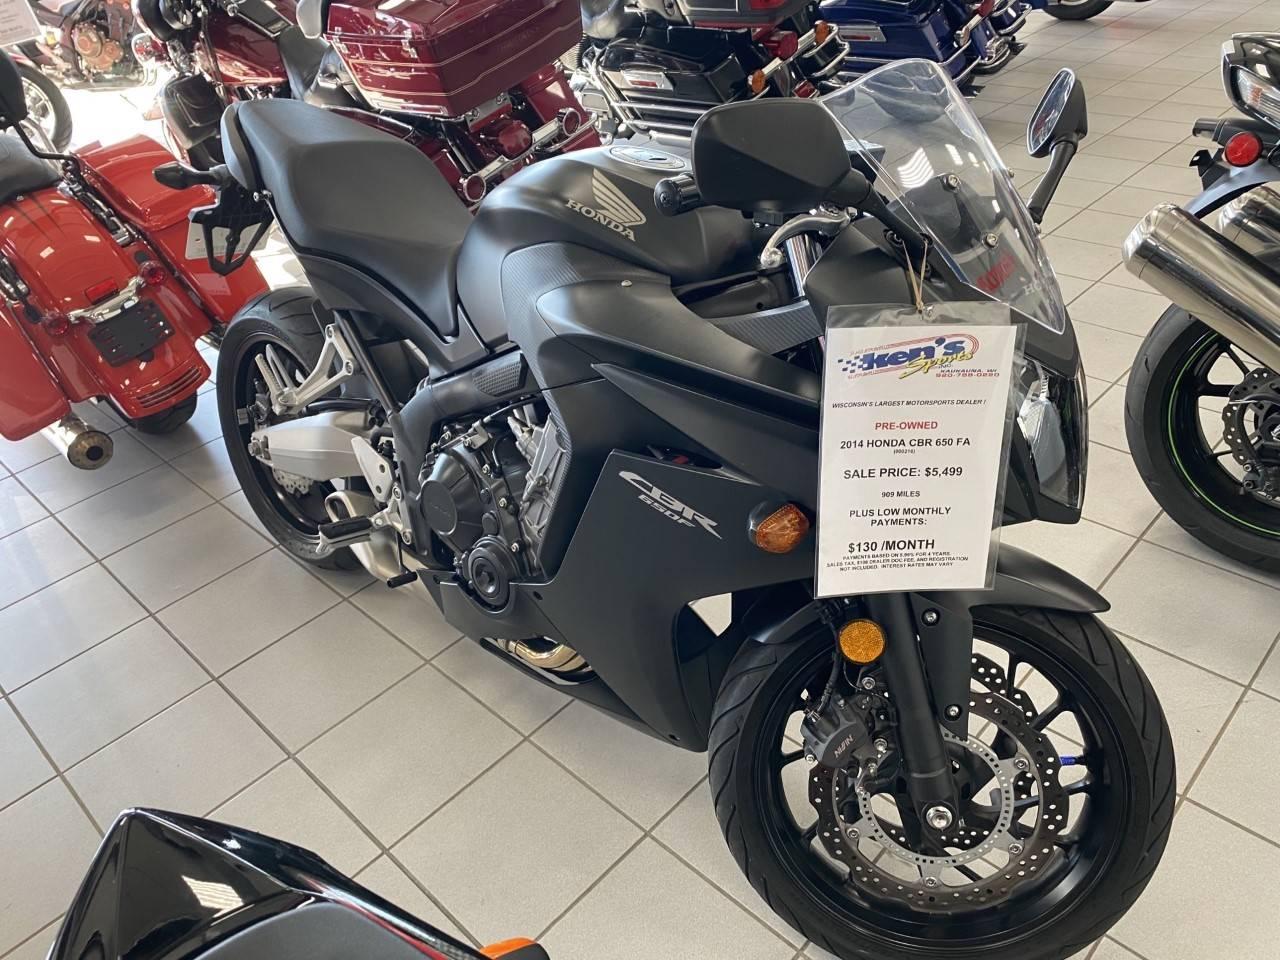 Used 2014 Honda Cbr 650f Abs Motorcycles In Kaukauna Wi 000216 Matte Black Metallic